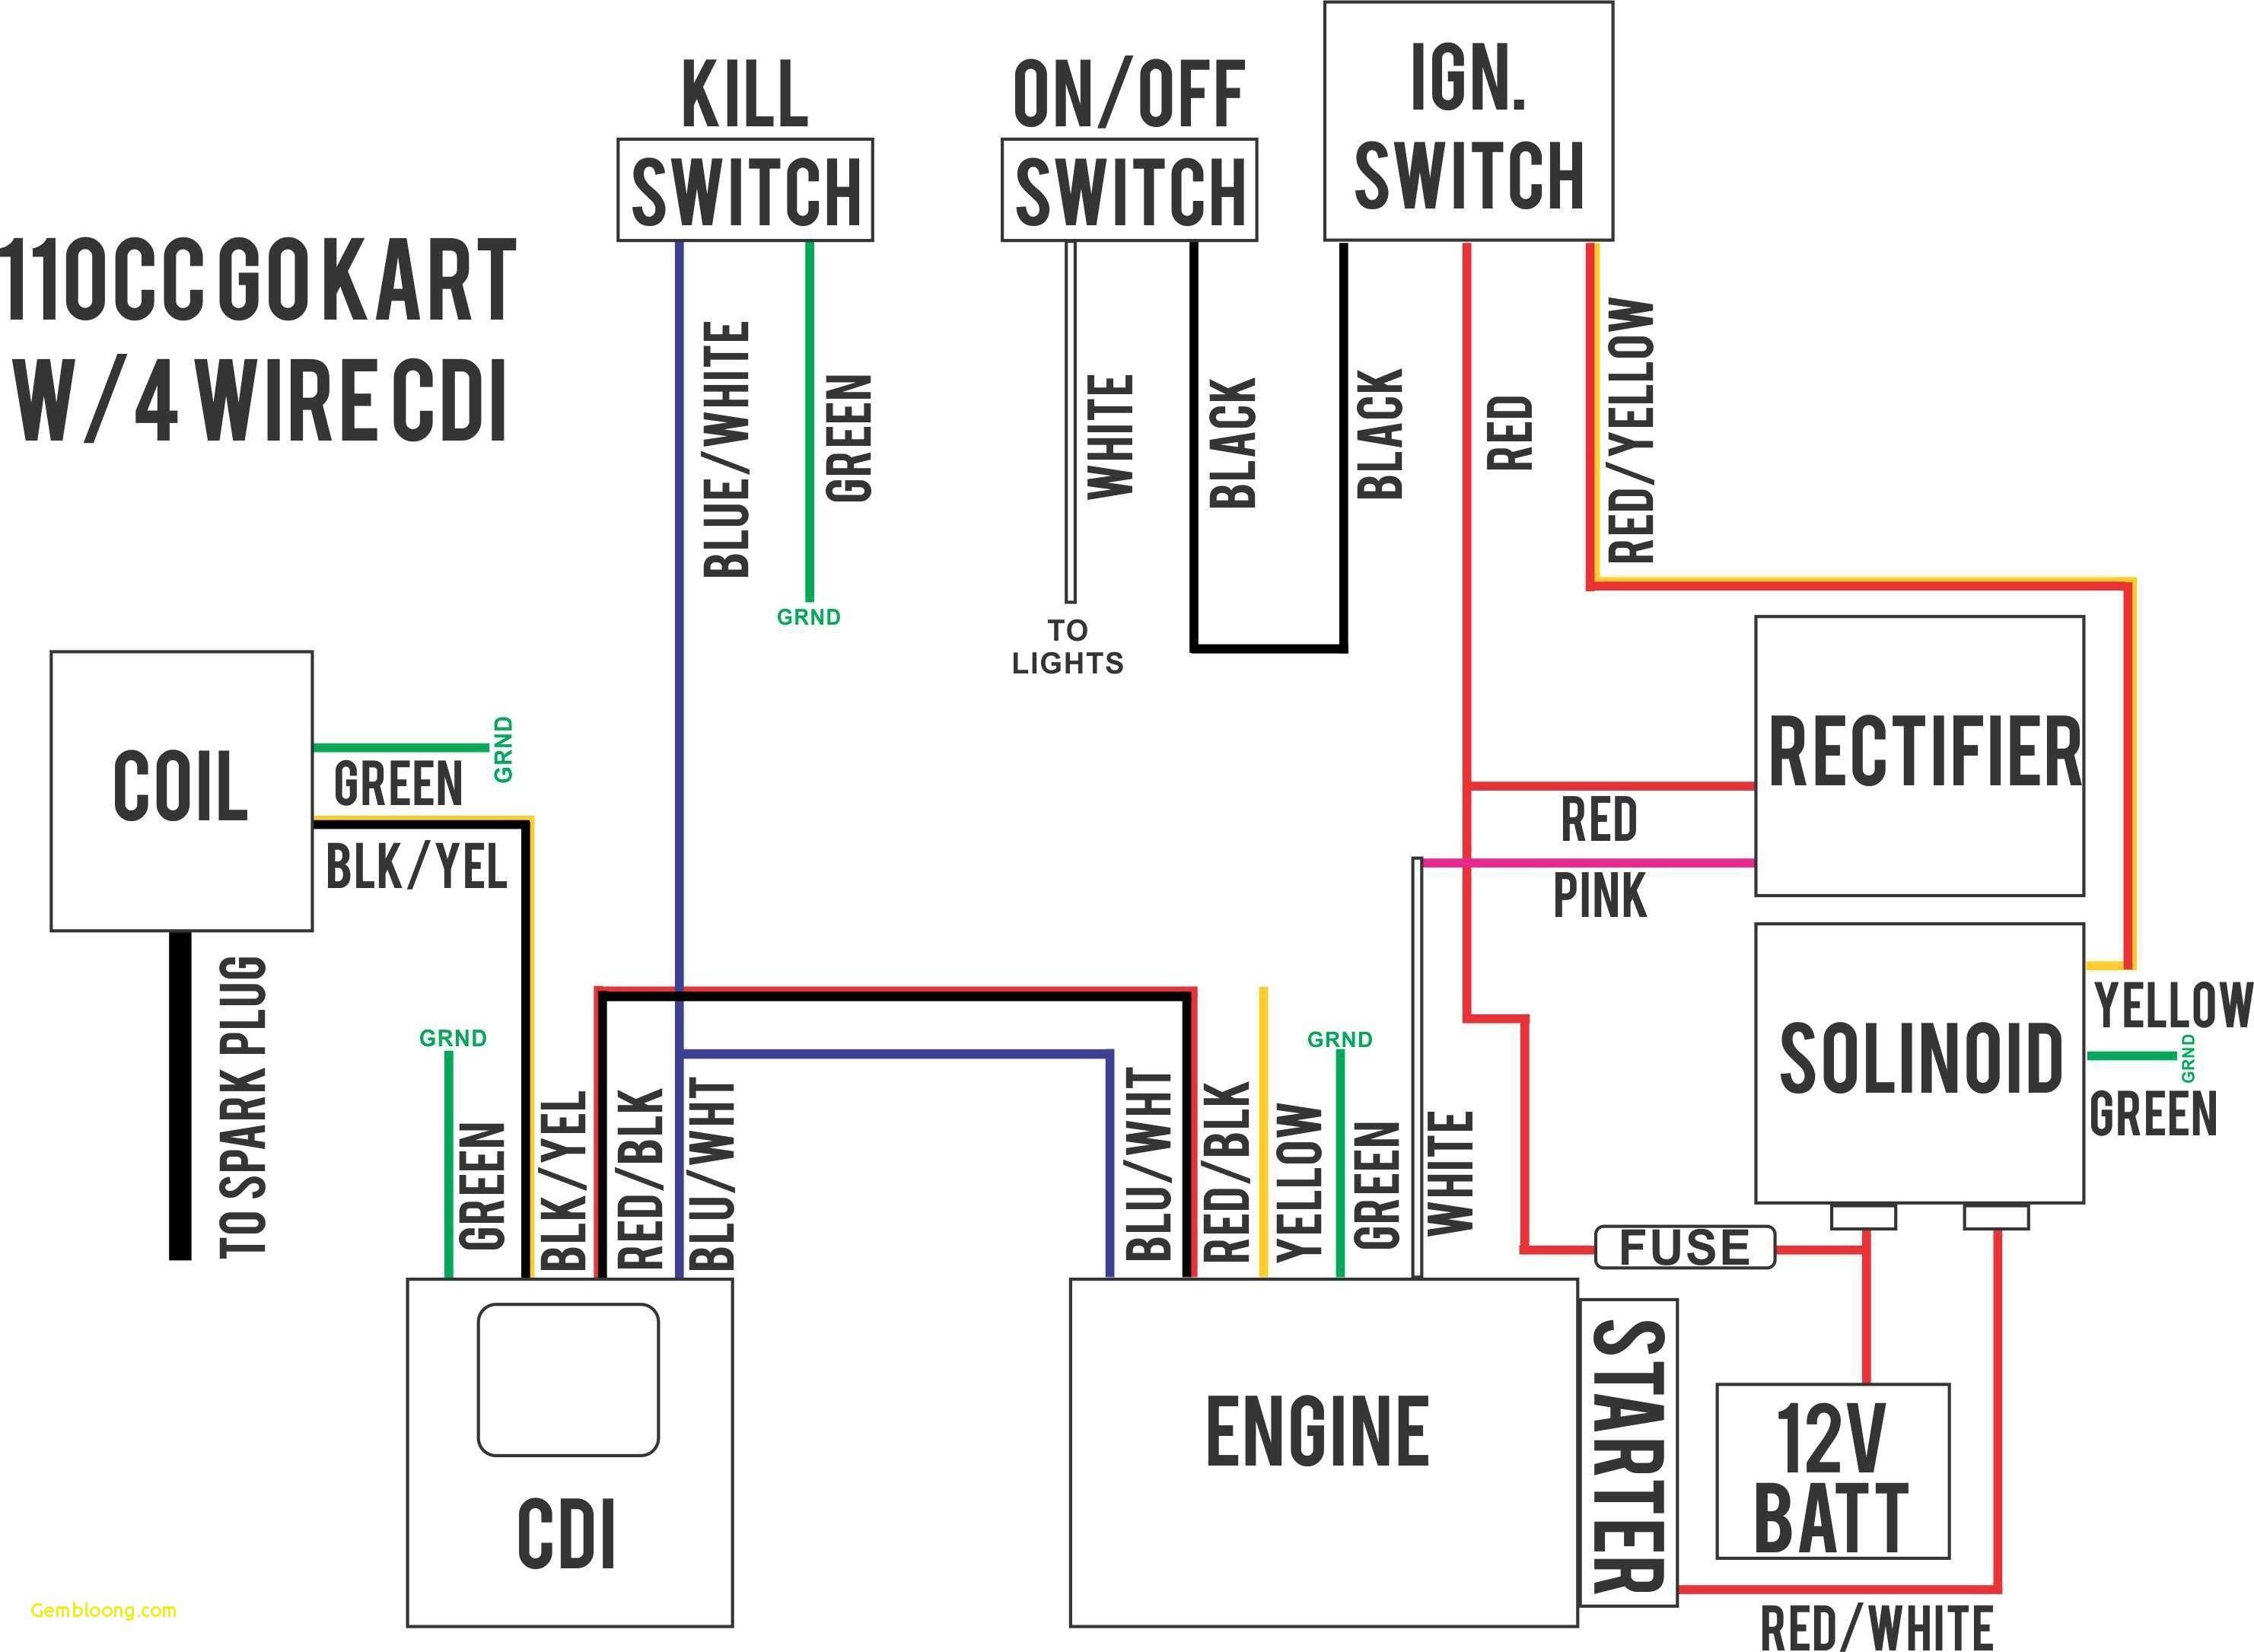 Bmw E46 Dme Wiring Diagram Diagram Diagramtemplate Diagramsample Kabel Listrik Diagram Dinding